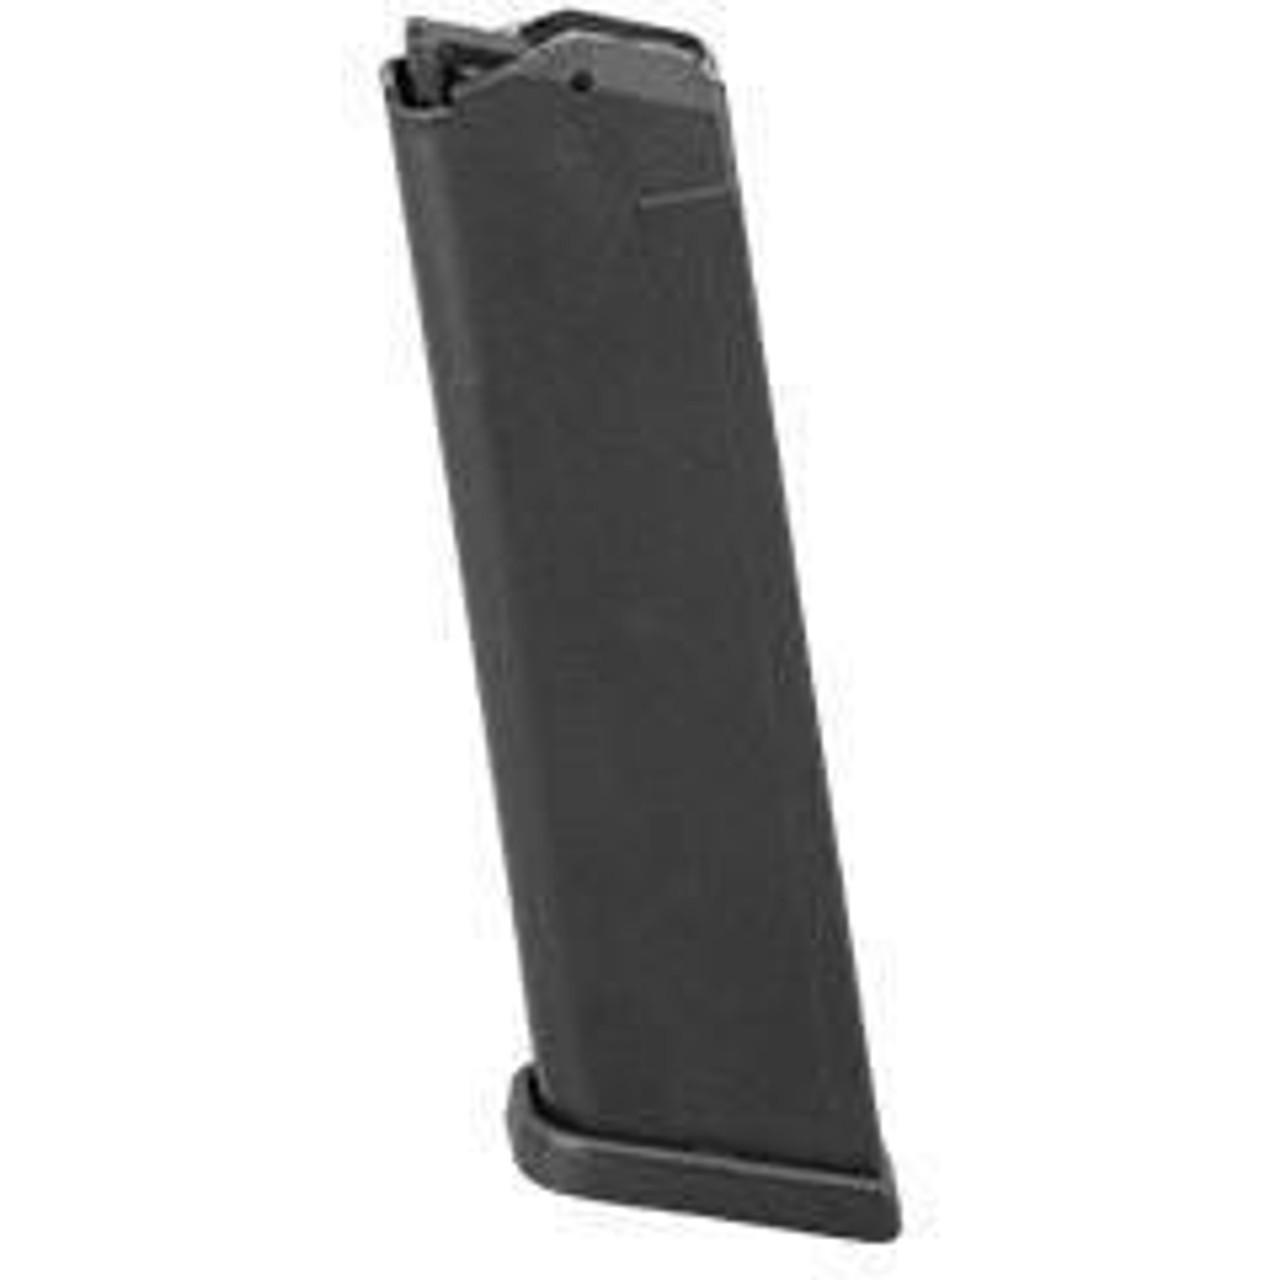 Glock OEM G17/34 9mm 10rd Magazine